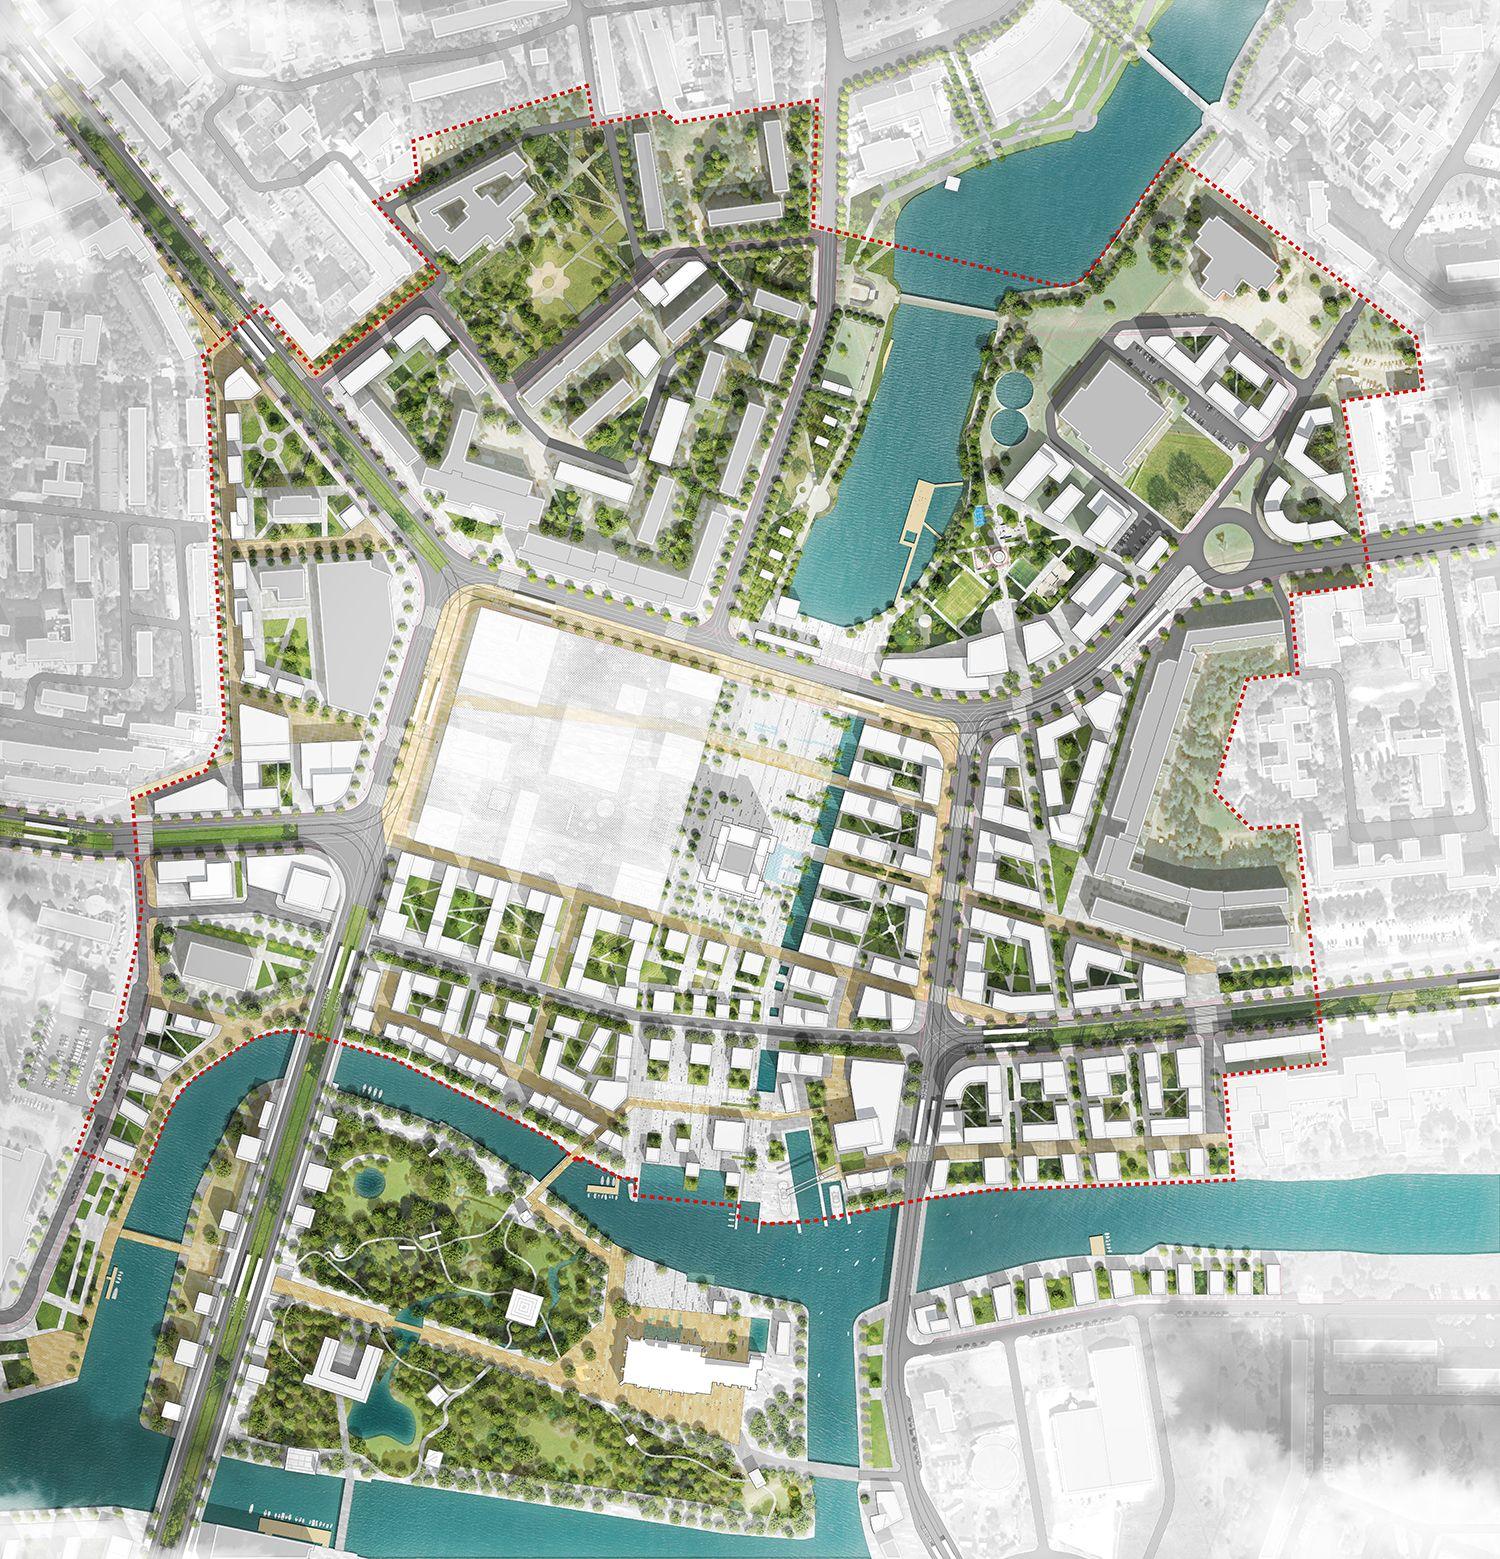 masterplan urban regeneration 2nd place at the international urban design competition of. Black Bedroom Furniture Sets. Home Design Ideas